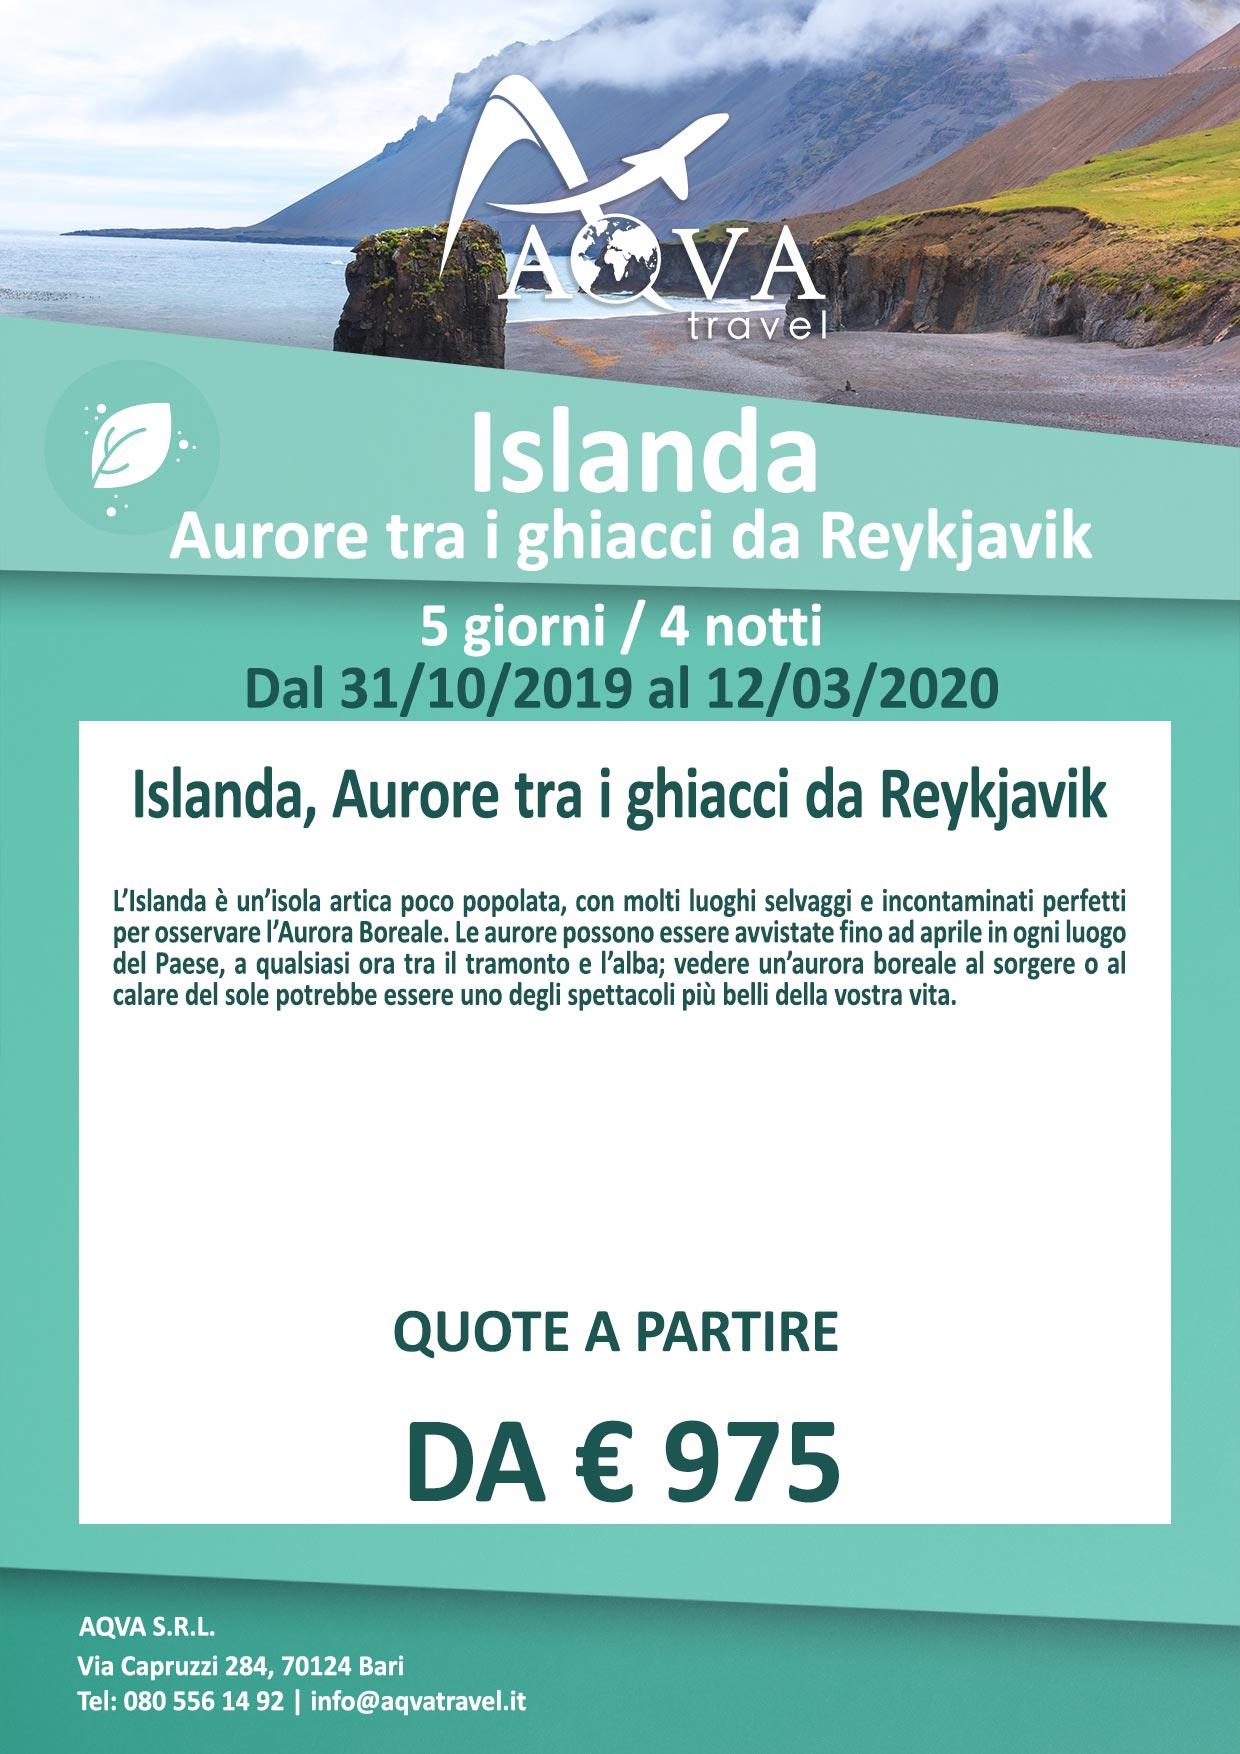 Islanda-Aurore-tra-i-ghiacci-da-Reykjavik-NATURA-offerte-agenzia-di-viaggi-Bari-AQVATRAVEL-it